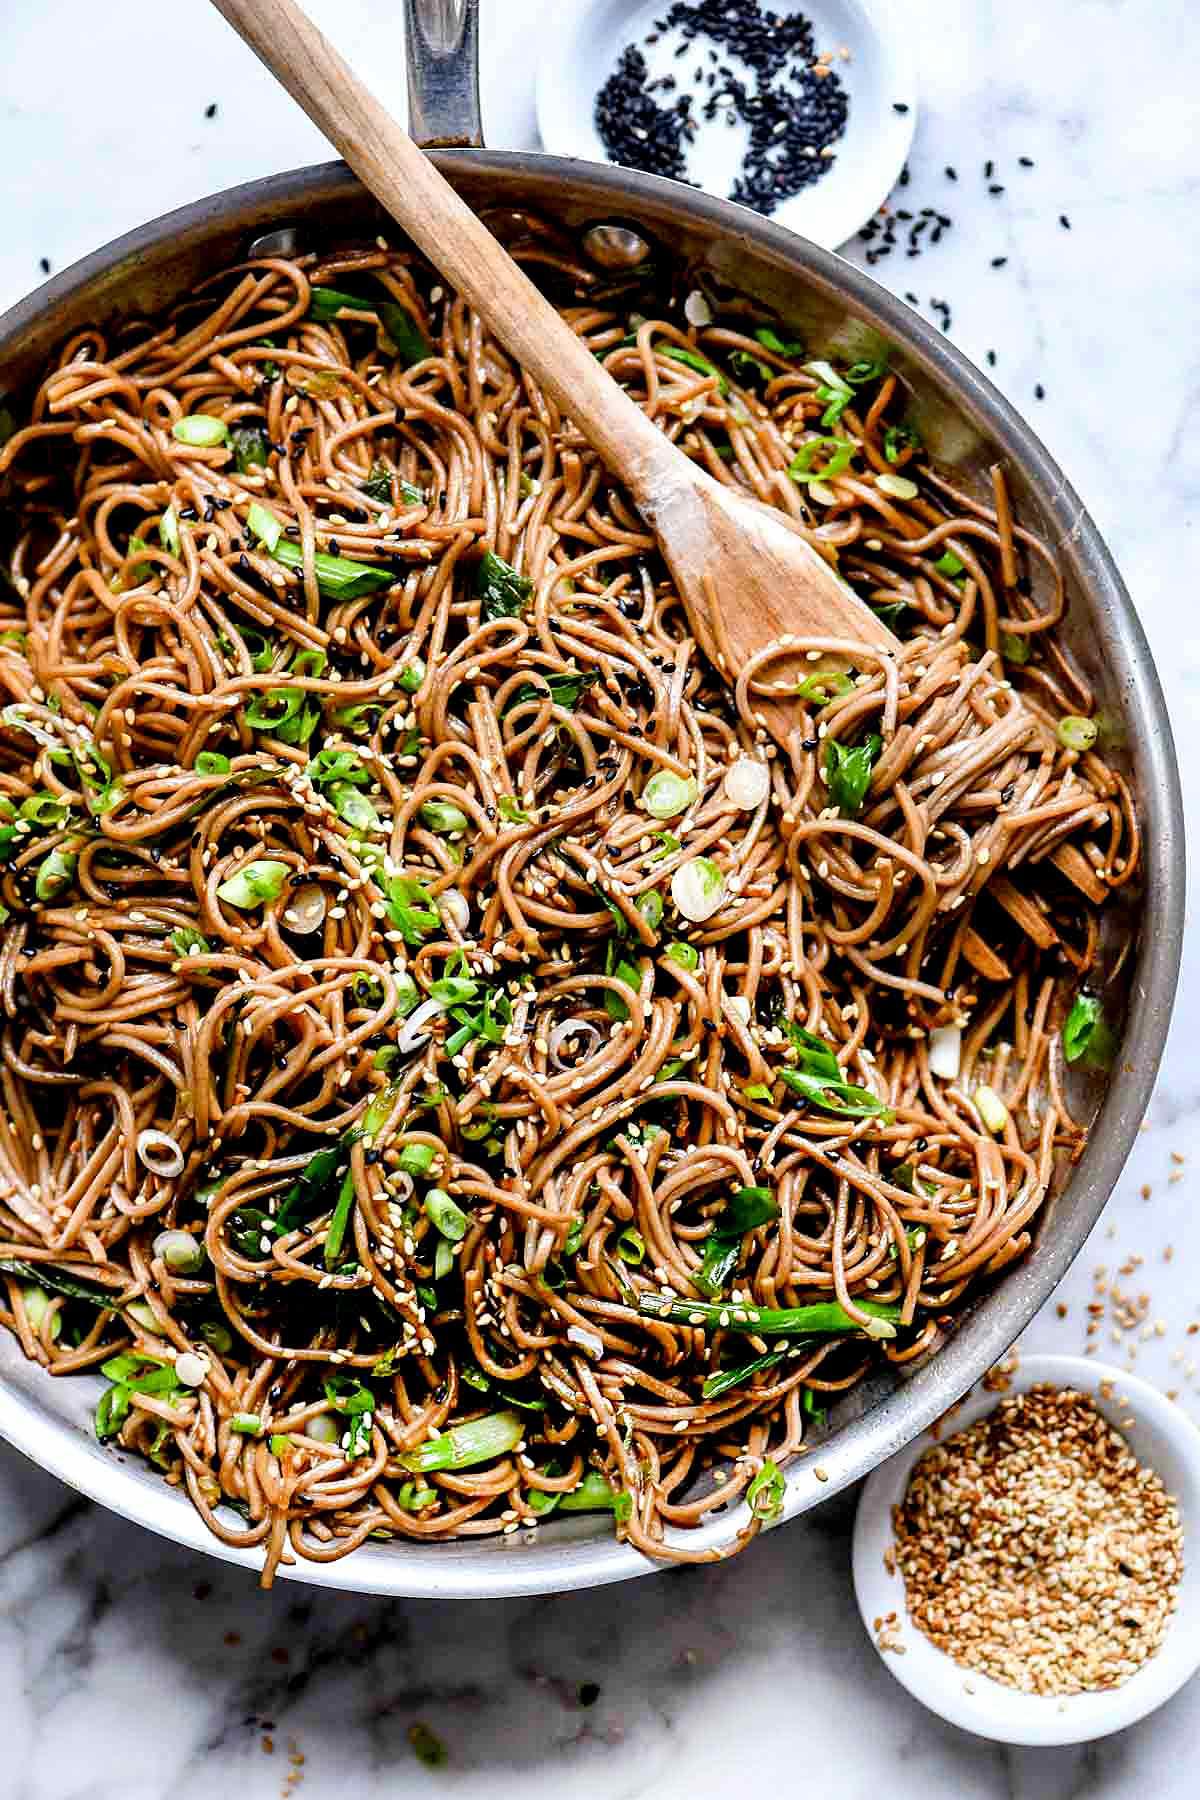 Sesame Soba Noodles | familycuisine.net #soba #noodles #sesame #recipe #healthy